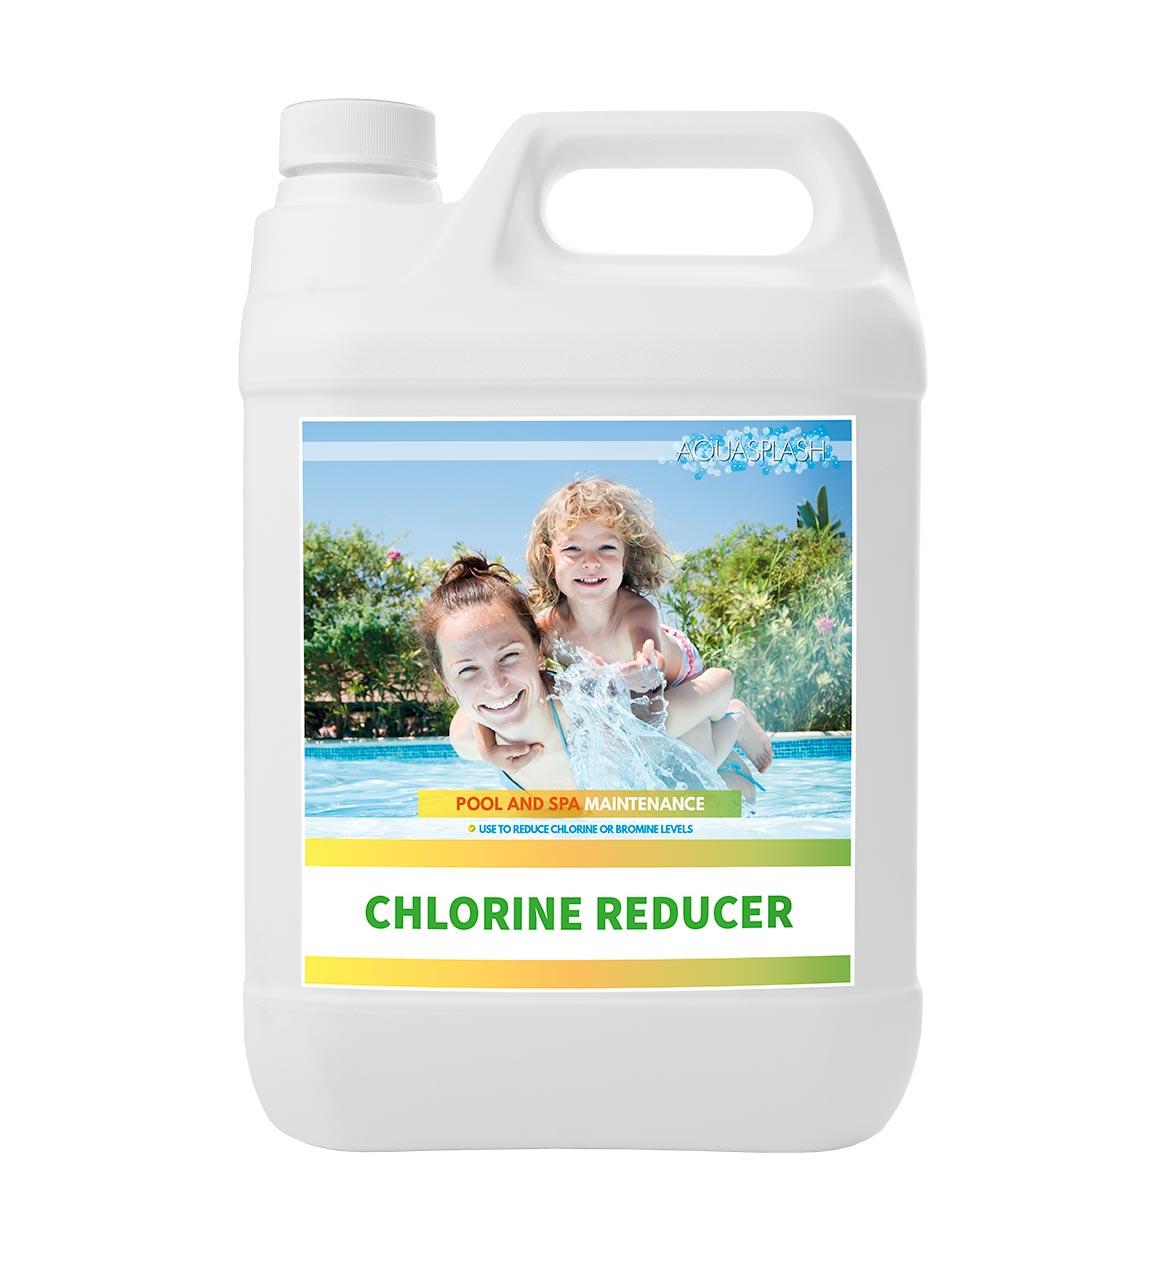 5kg aquasplash chlorine reducer swimming pool chemicals